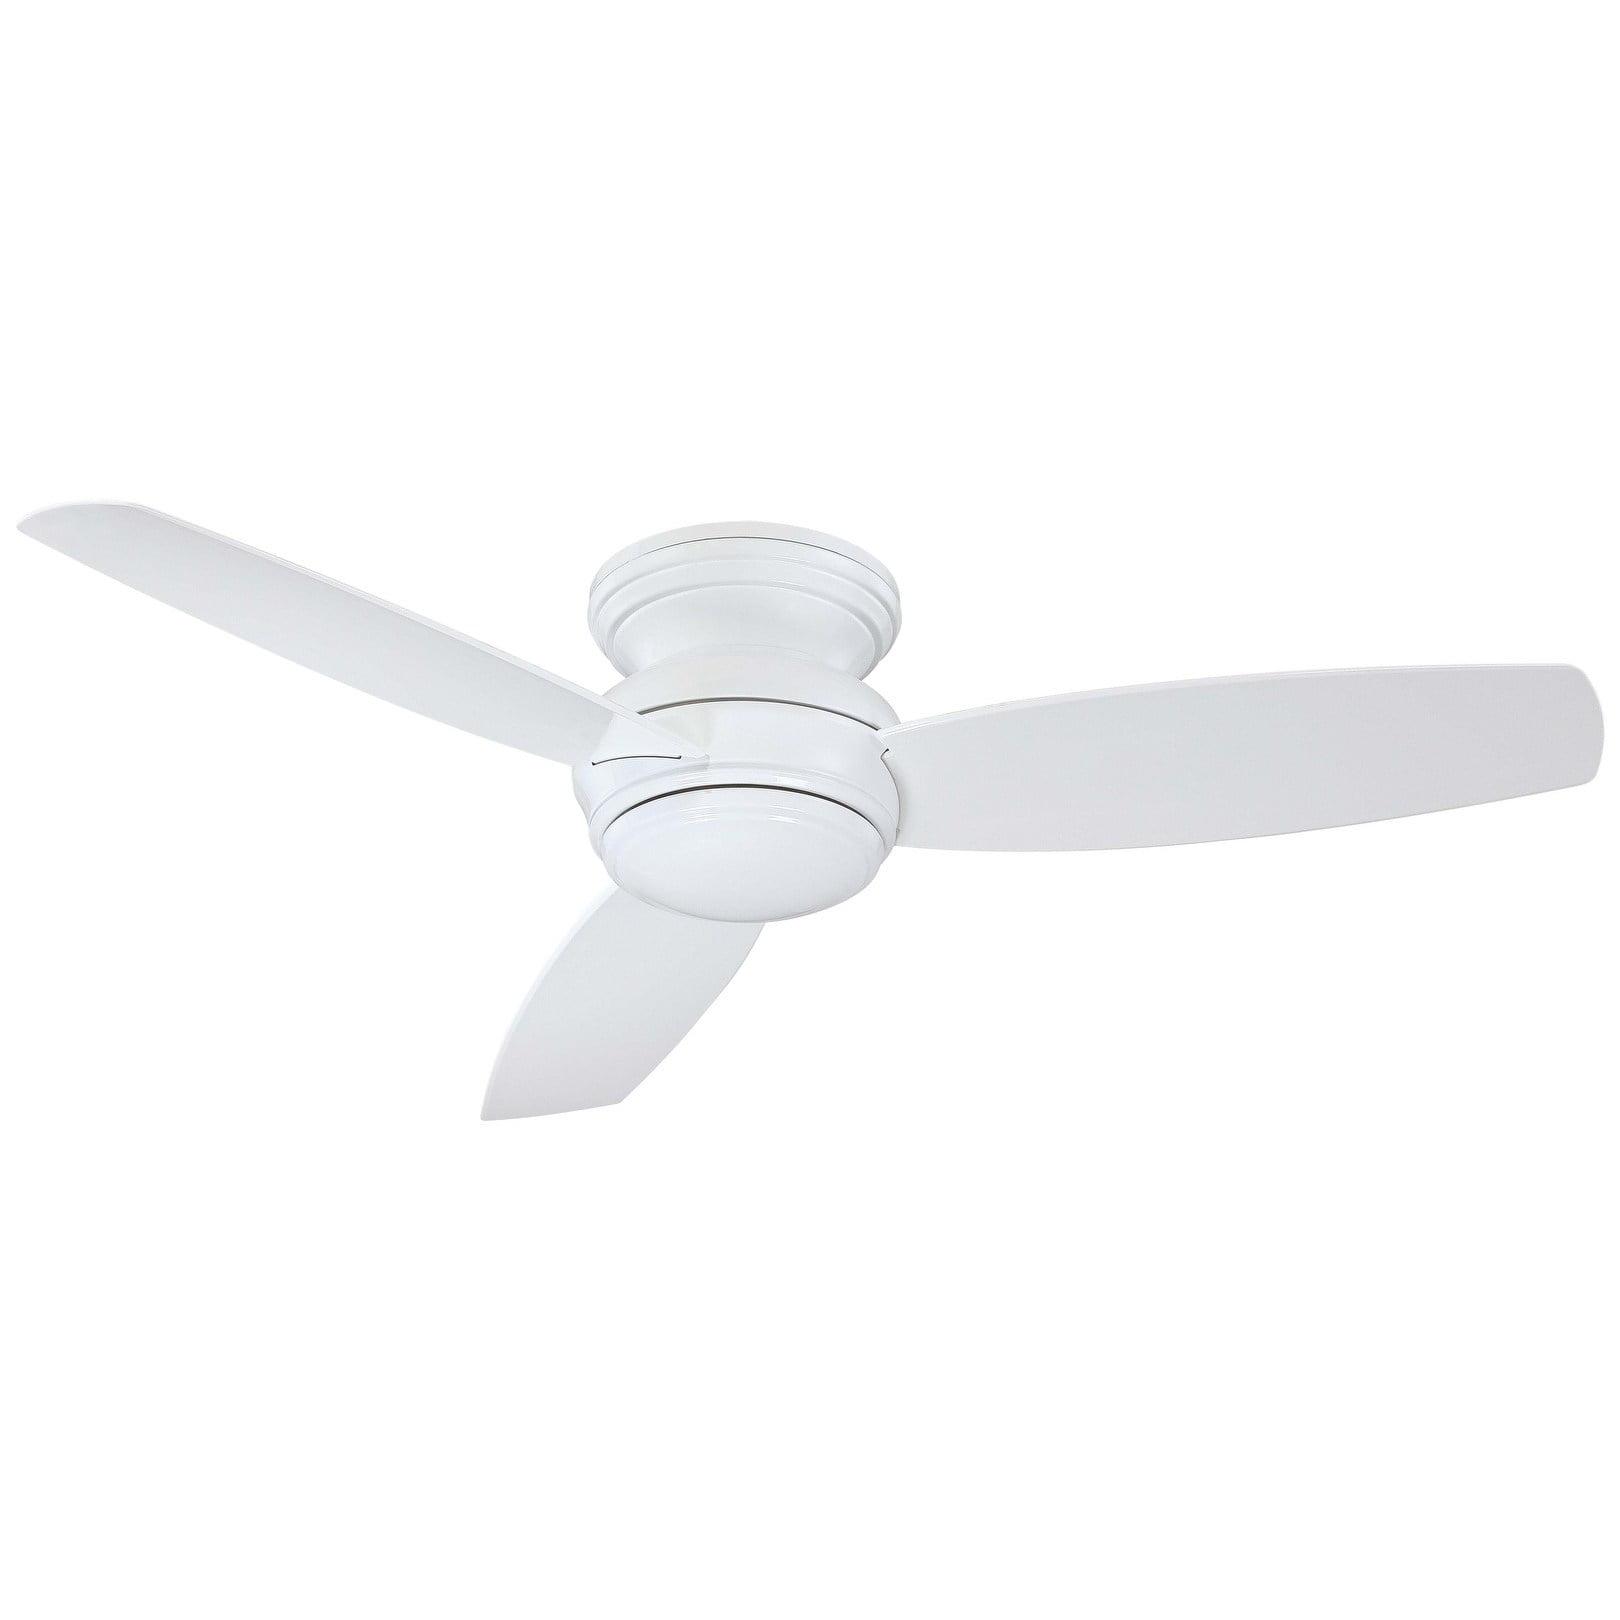 "Minka Aire F594L-Wh 52"" Led Flush Mount Ceiling Fan In White"